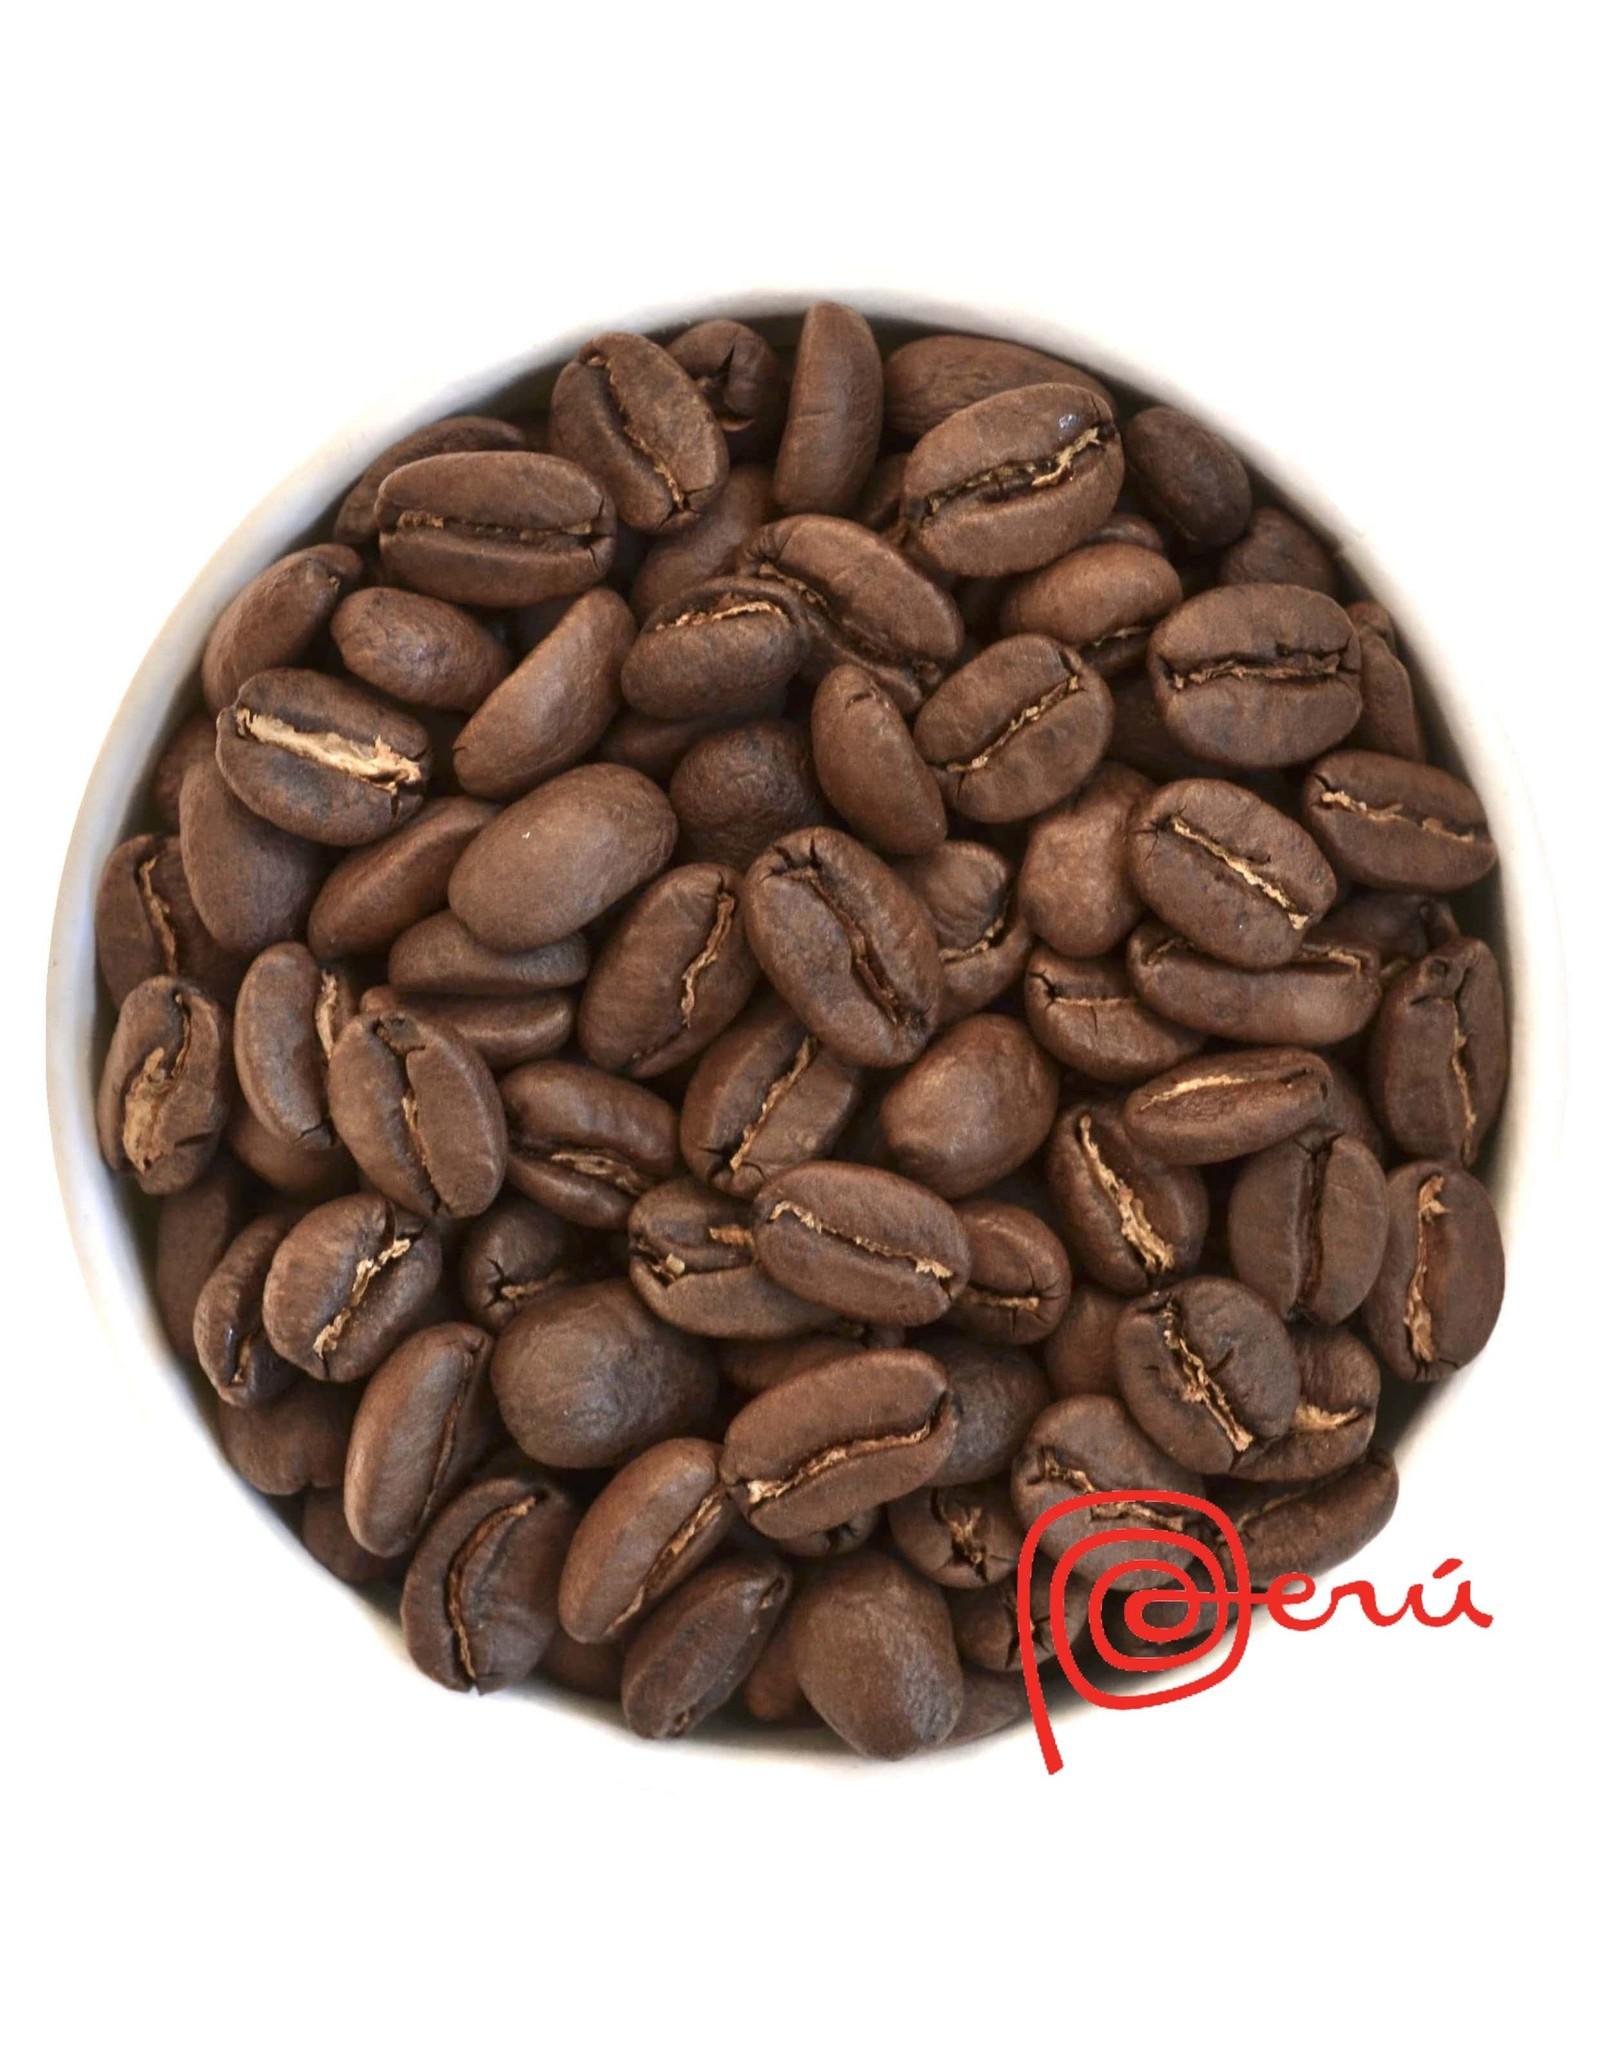 Koffiebranderij Sao Paulo PERU BIO GRADE 1 'MONTE VERDE'